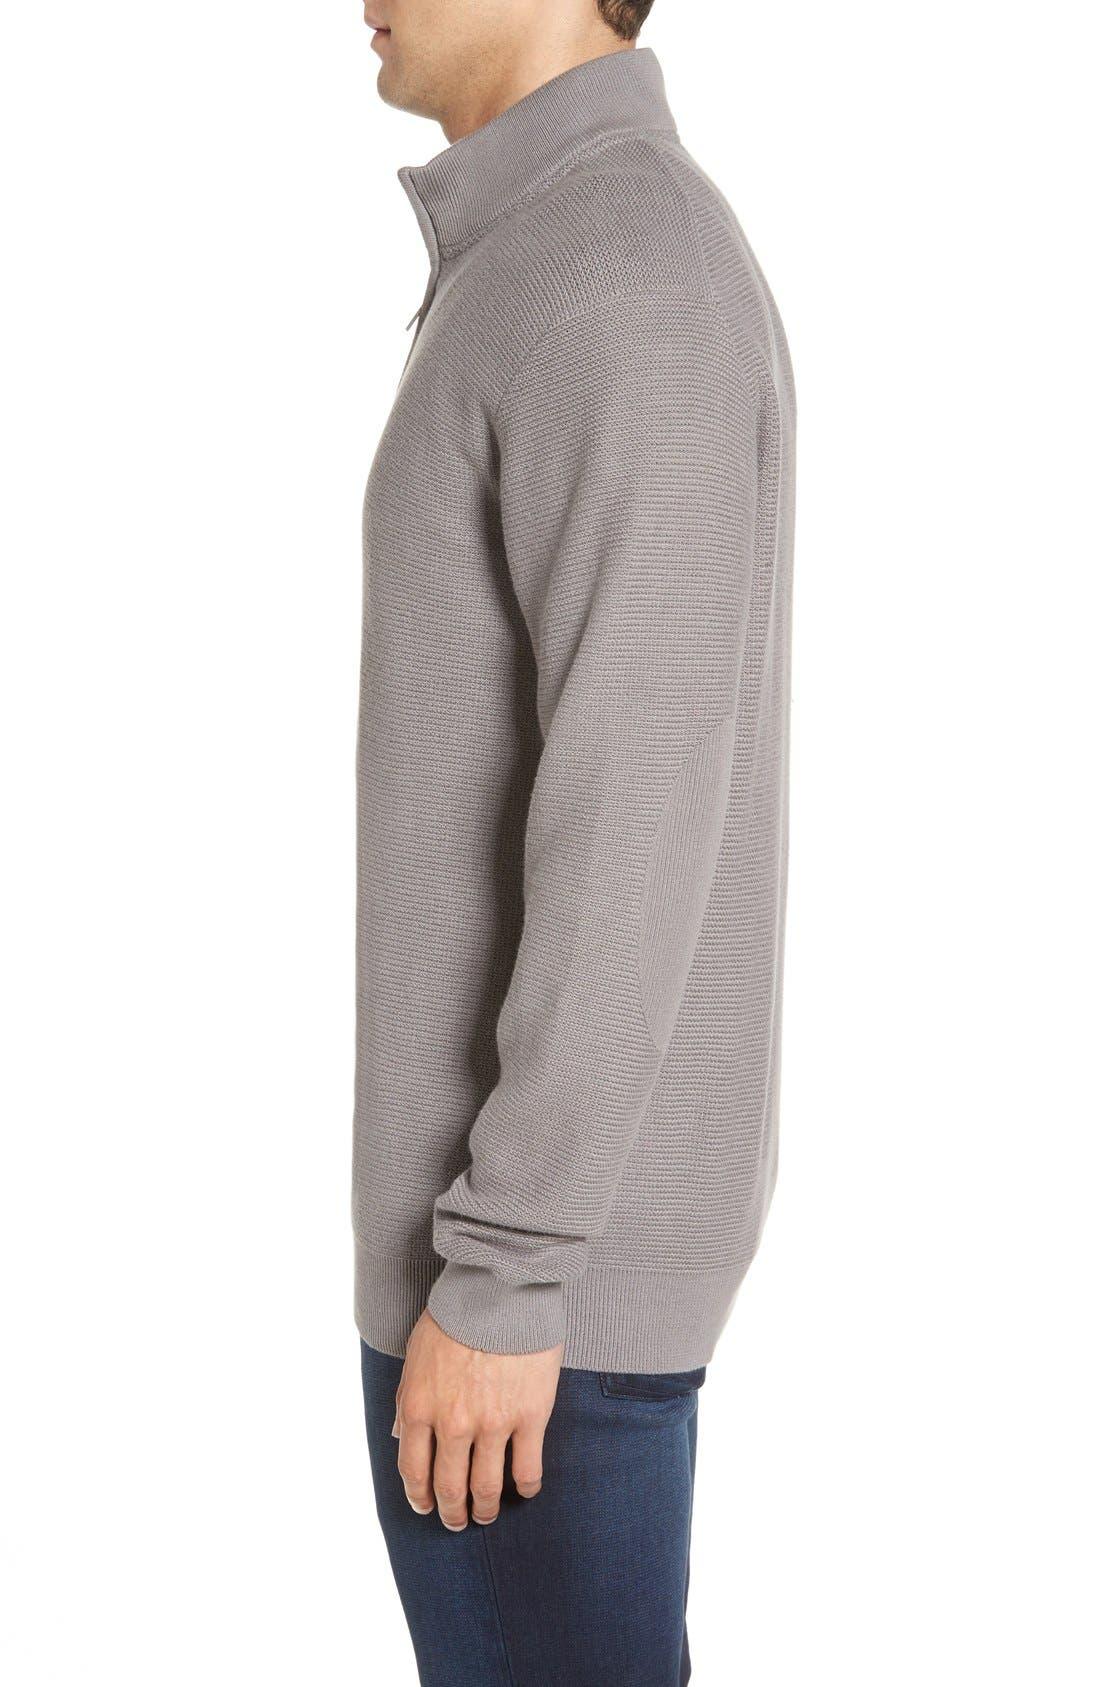 'Benson' Quarter Zip Textured Knit Sweater,                             Alternate thumbnail 5, color,